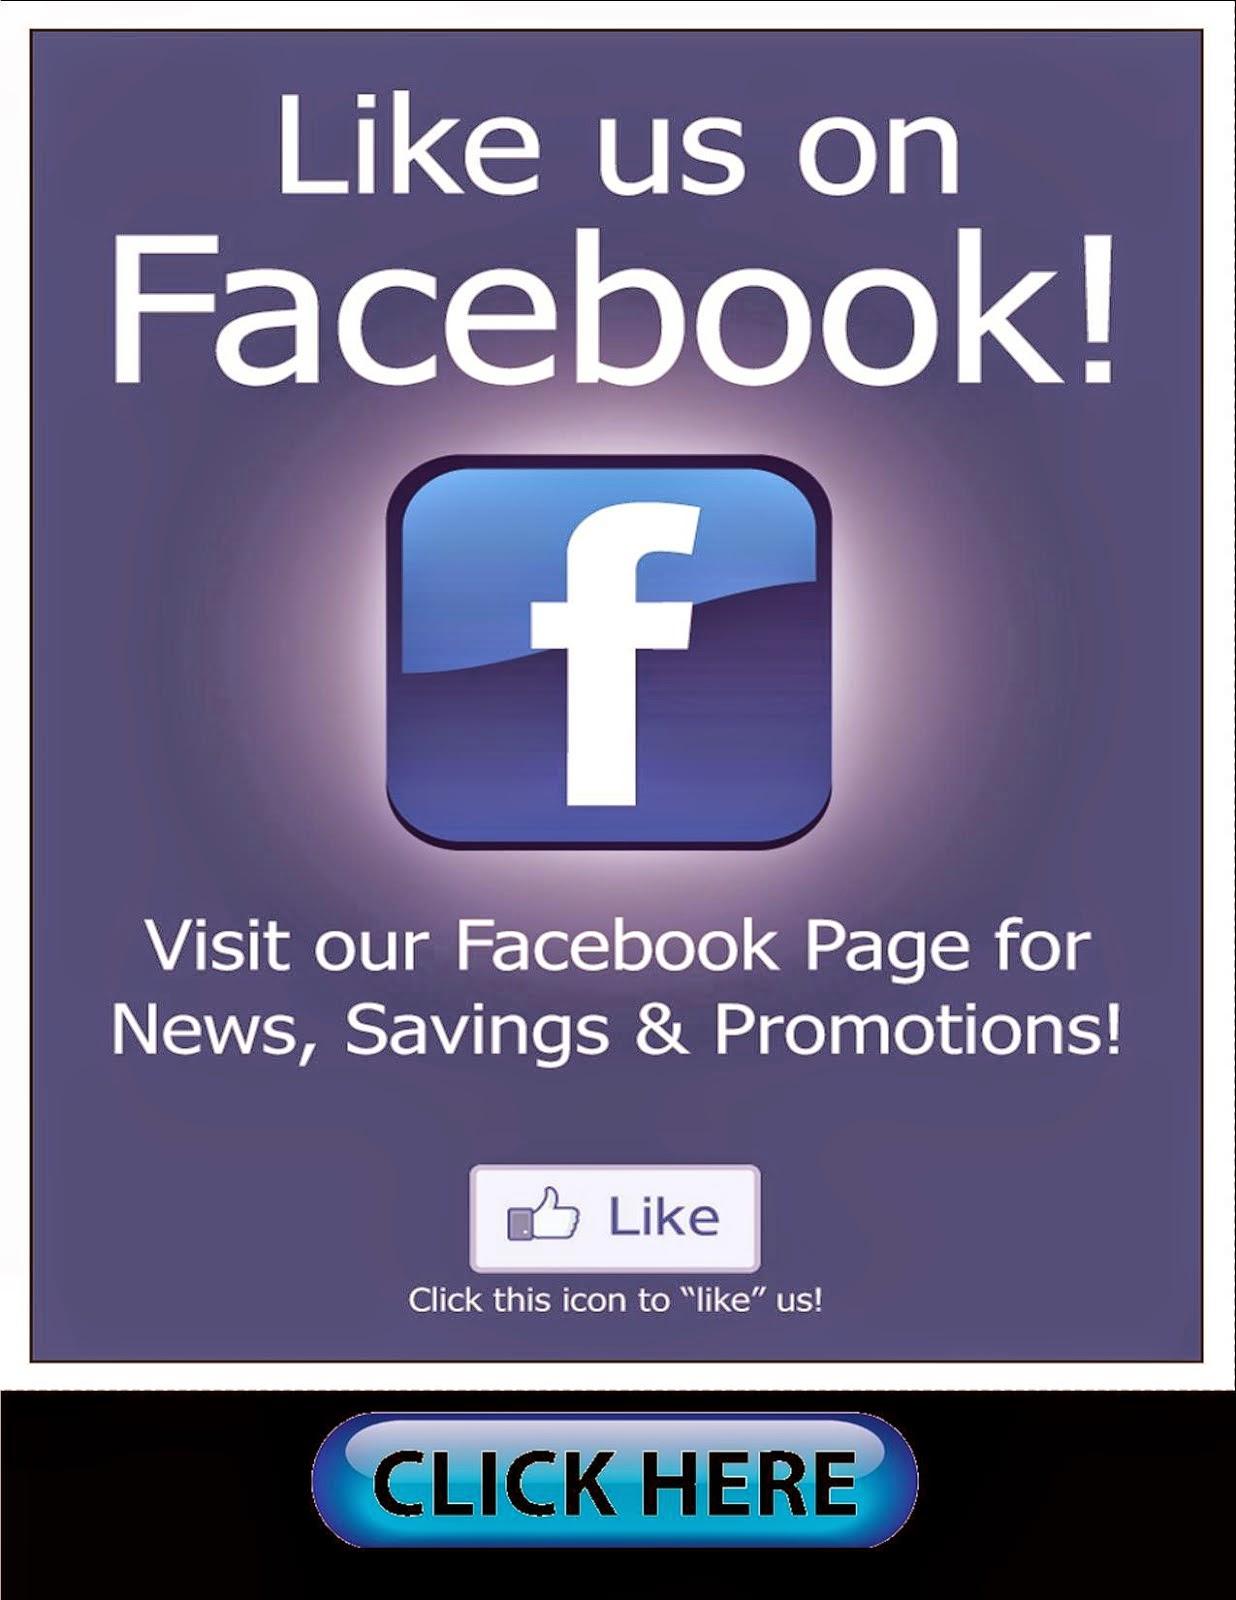 https://www.facebook.com/?sk=welcome#!/GrandRapidsScooter